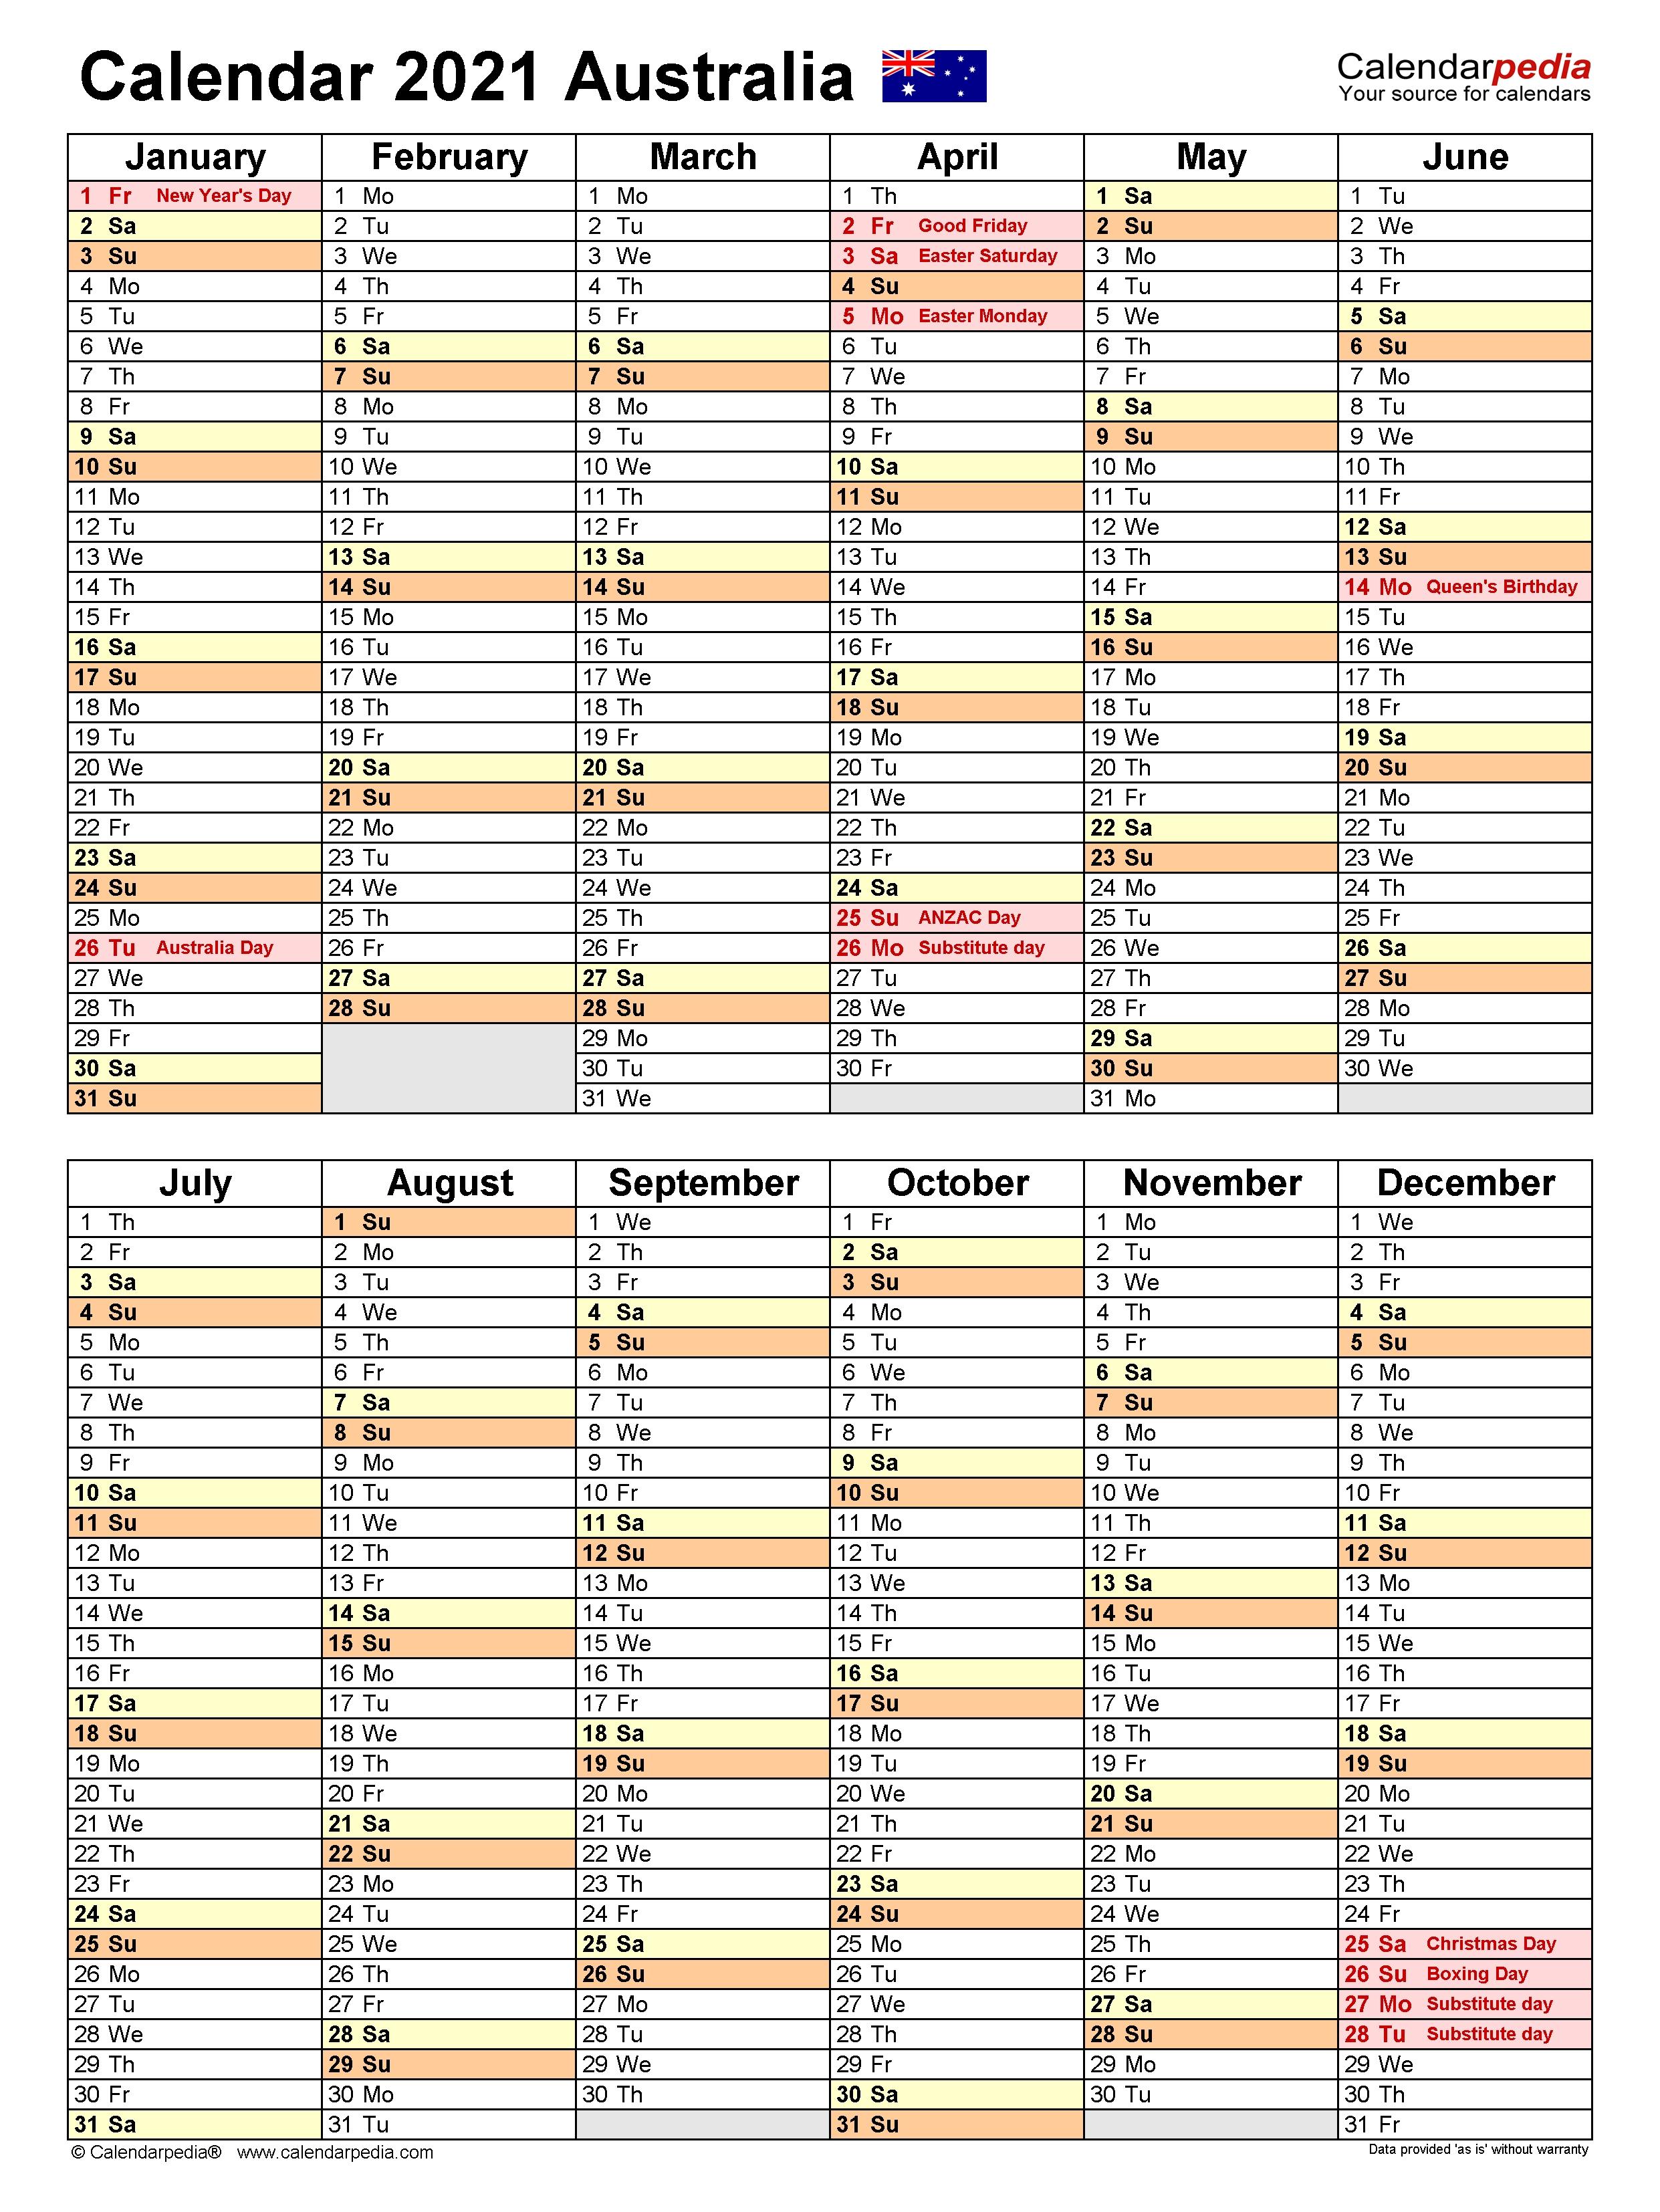 Australia Calendar 2021 - Free Printable Excel Templates  Fy 2021 Calendar Australia